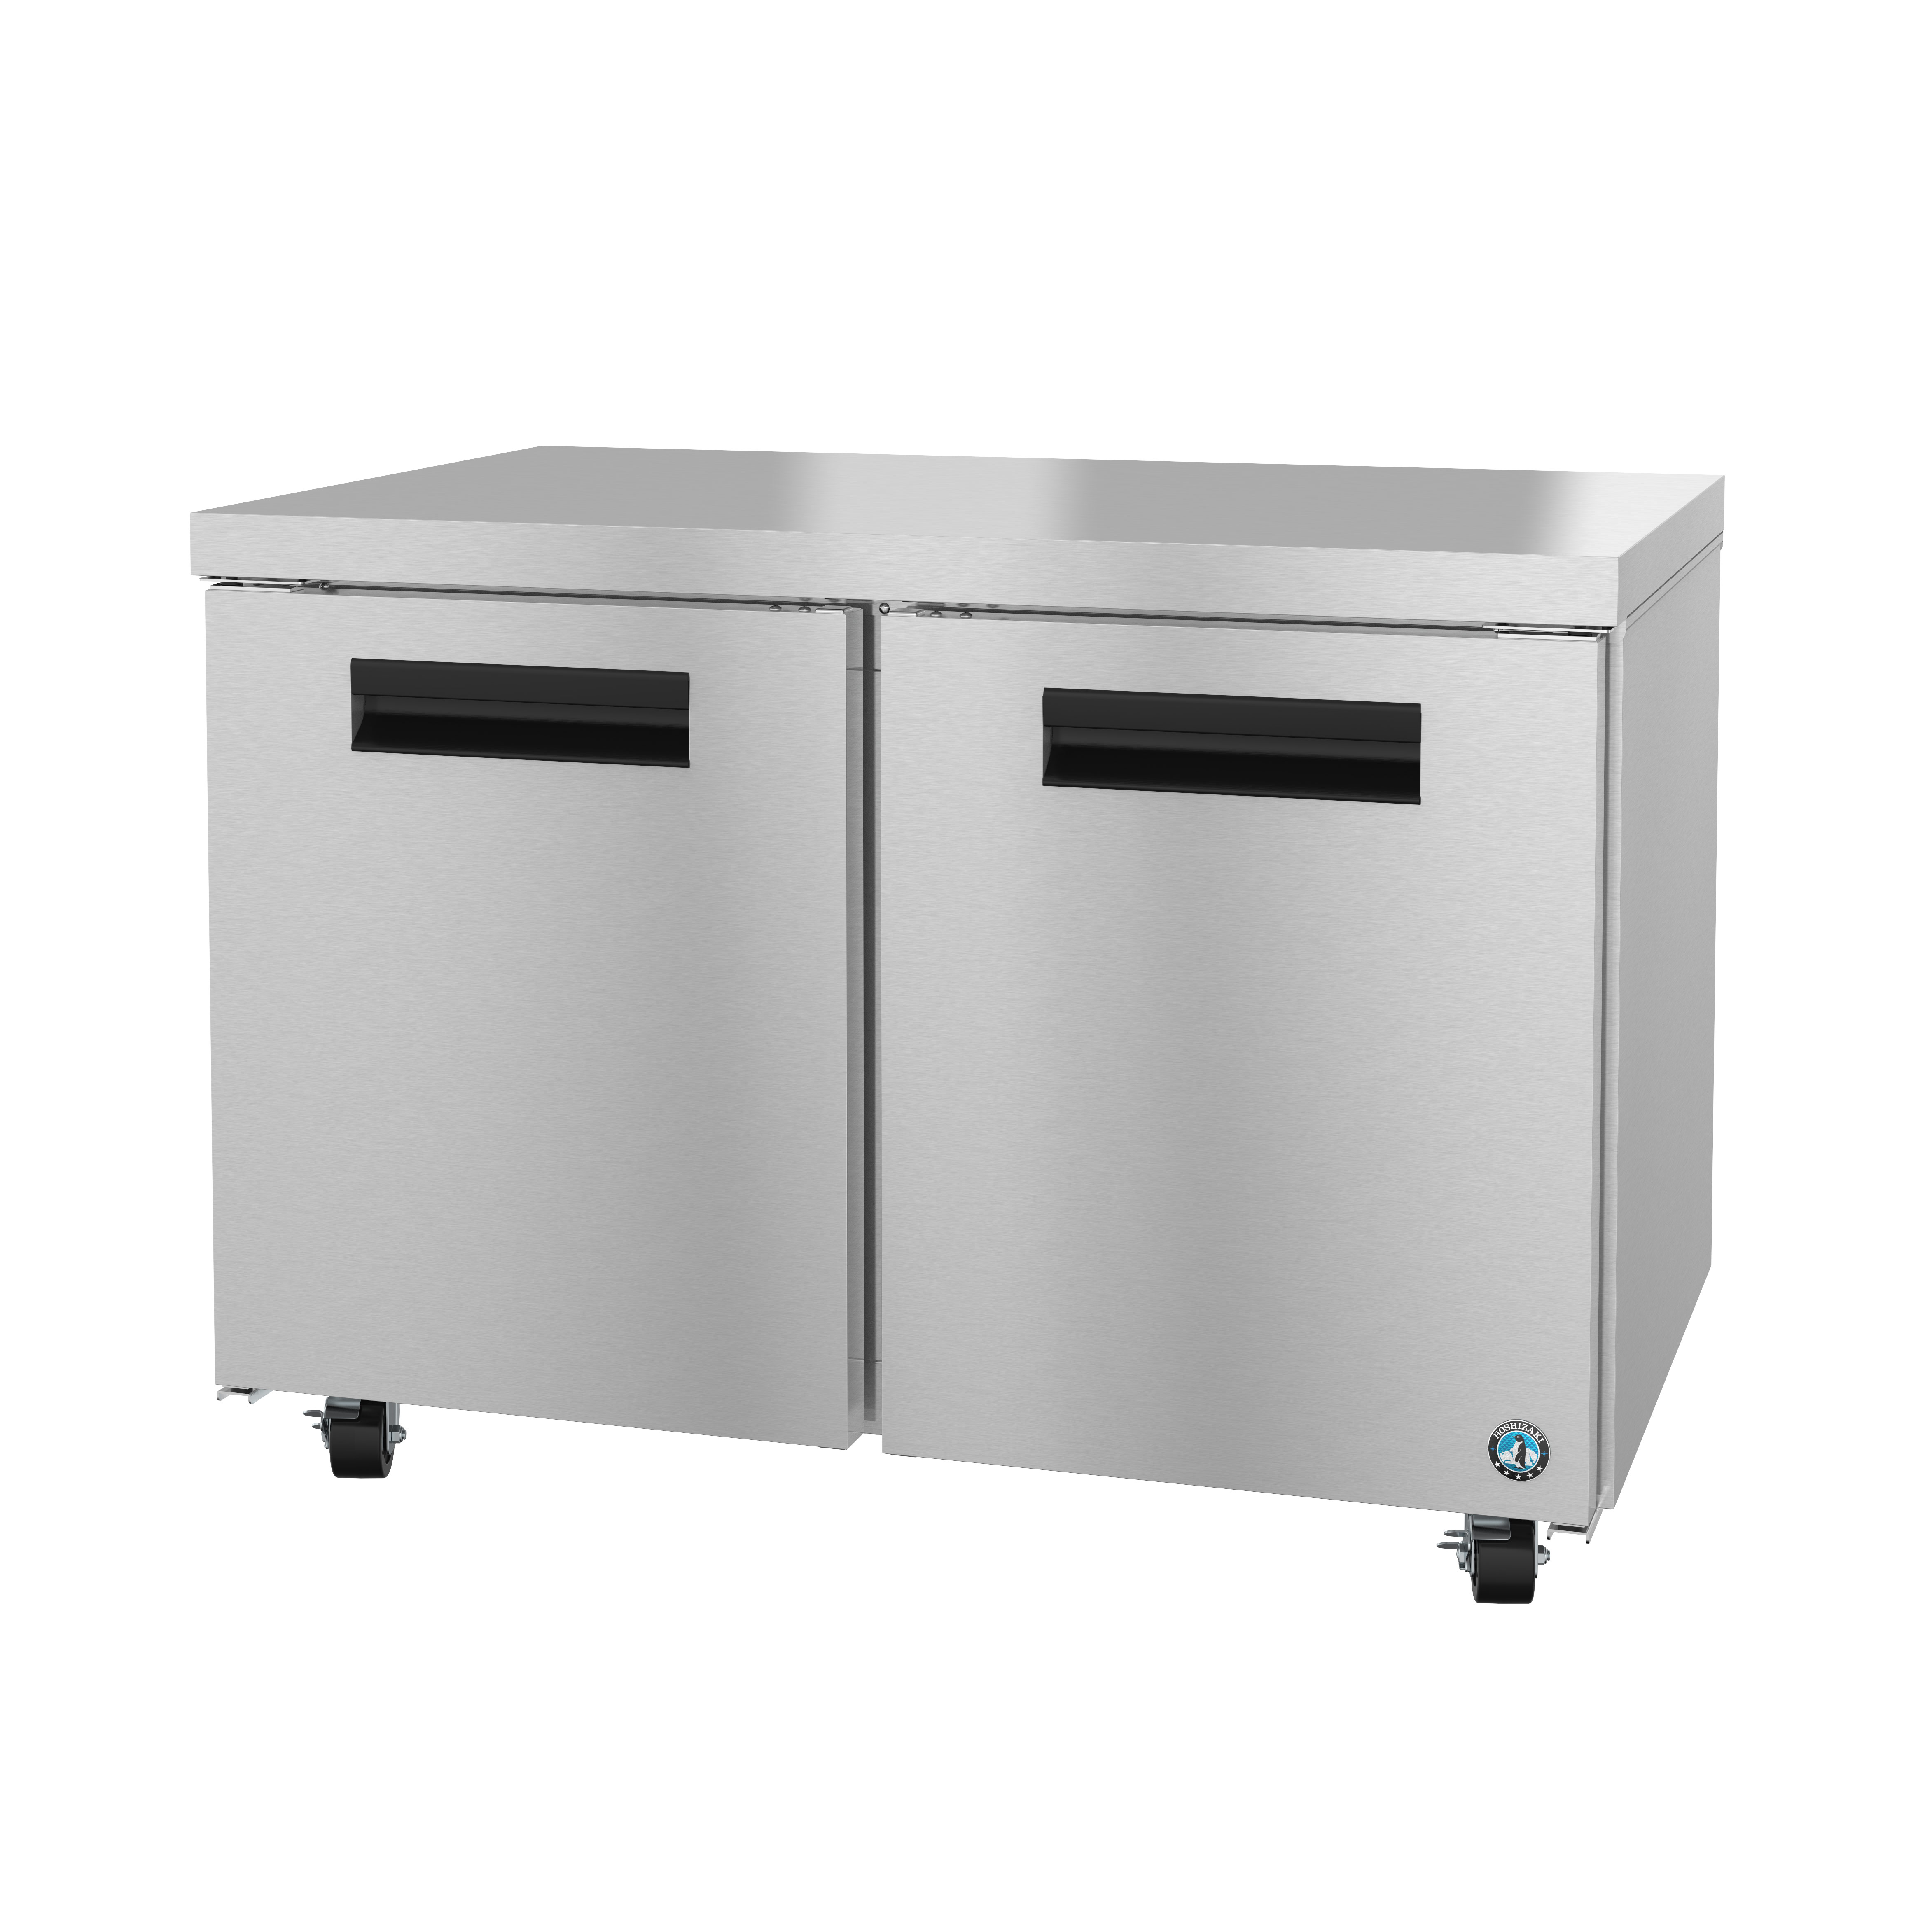 Hoshizaki UR48A refrigerator, undercounter, reach-in